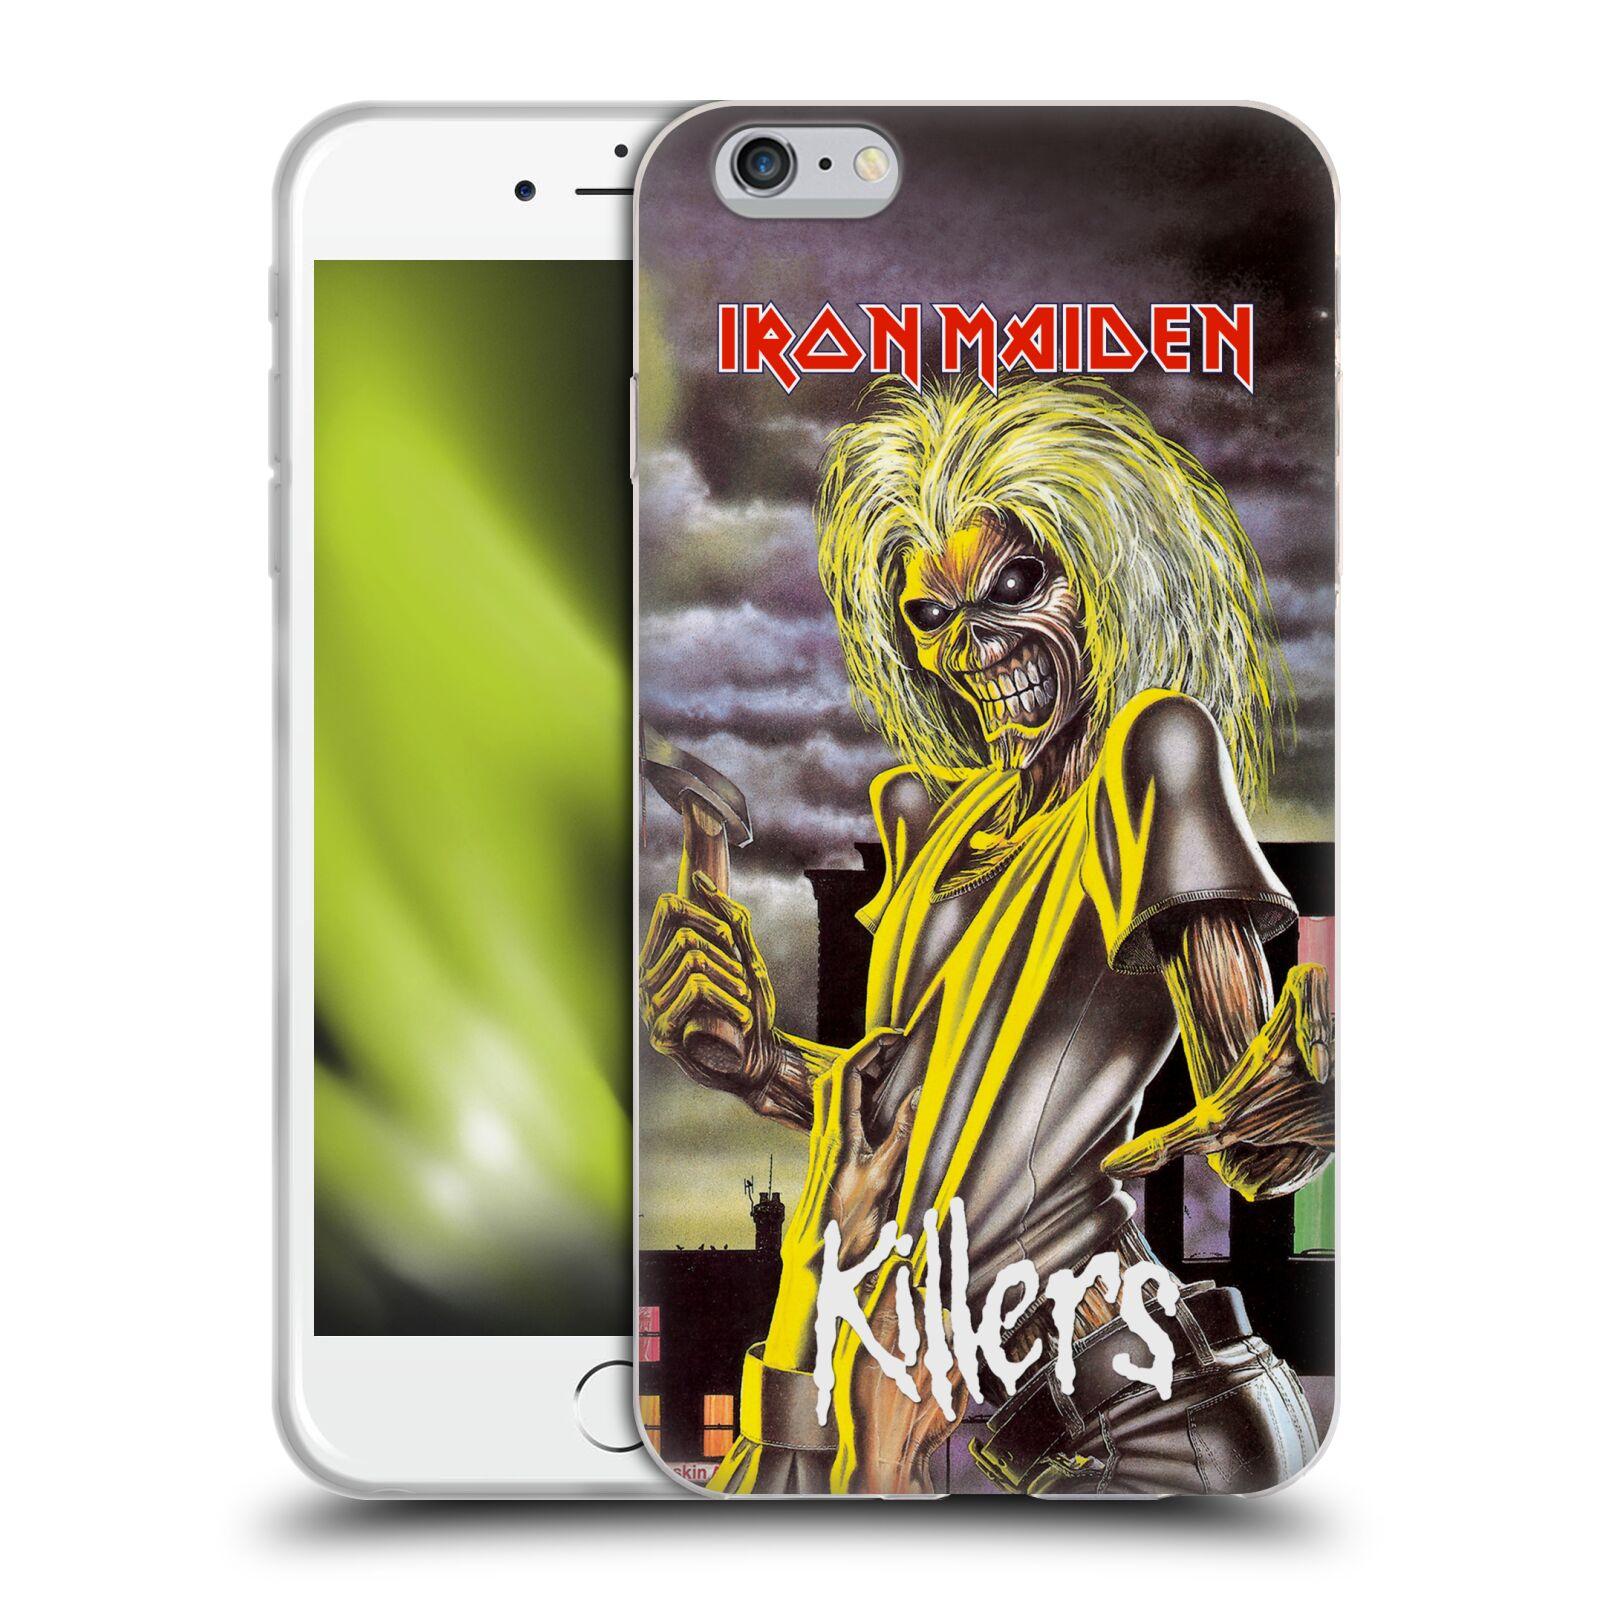 HEAD CASE silikonový obal na mobil Apple Iphone 6/6S PLUS Heavymetalová skupina Iron Maiden Killers